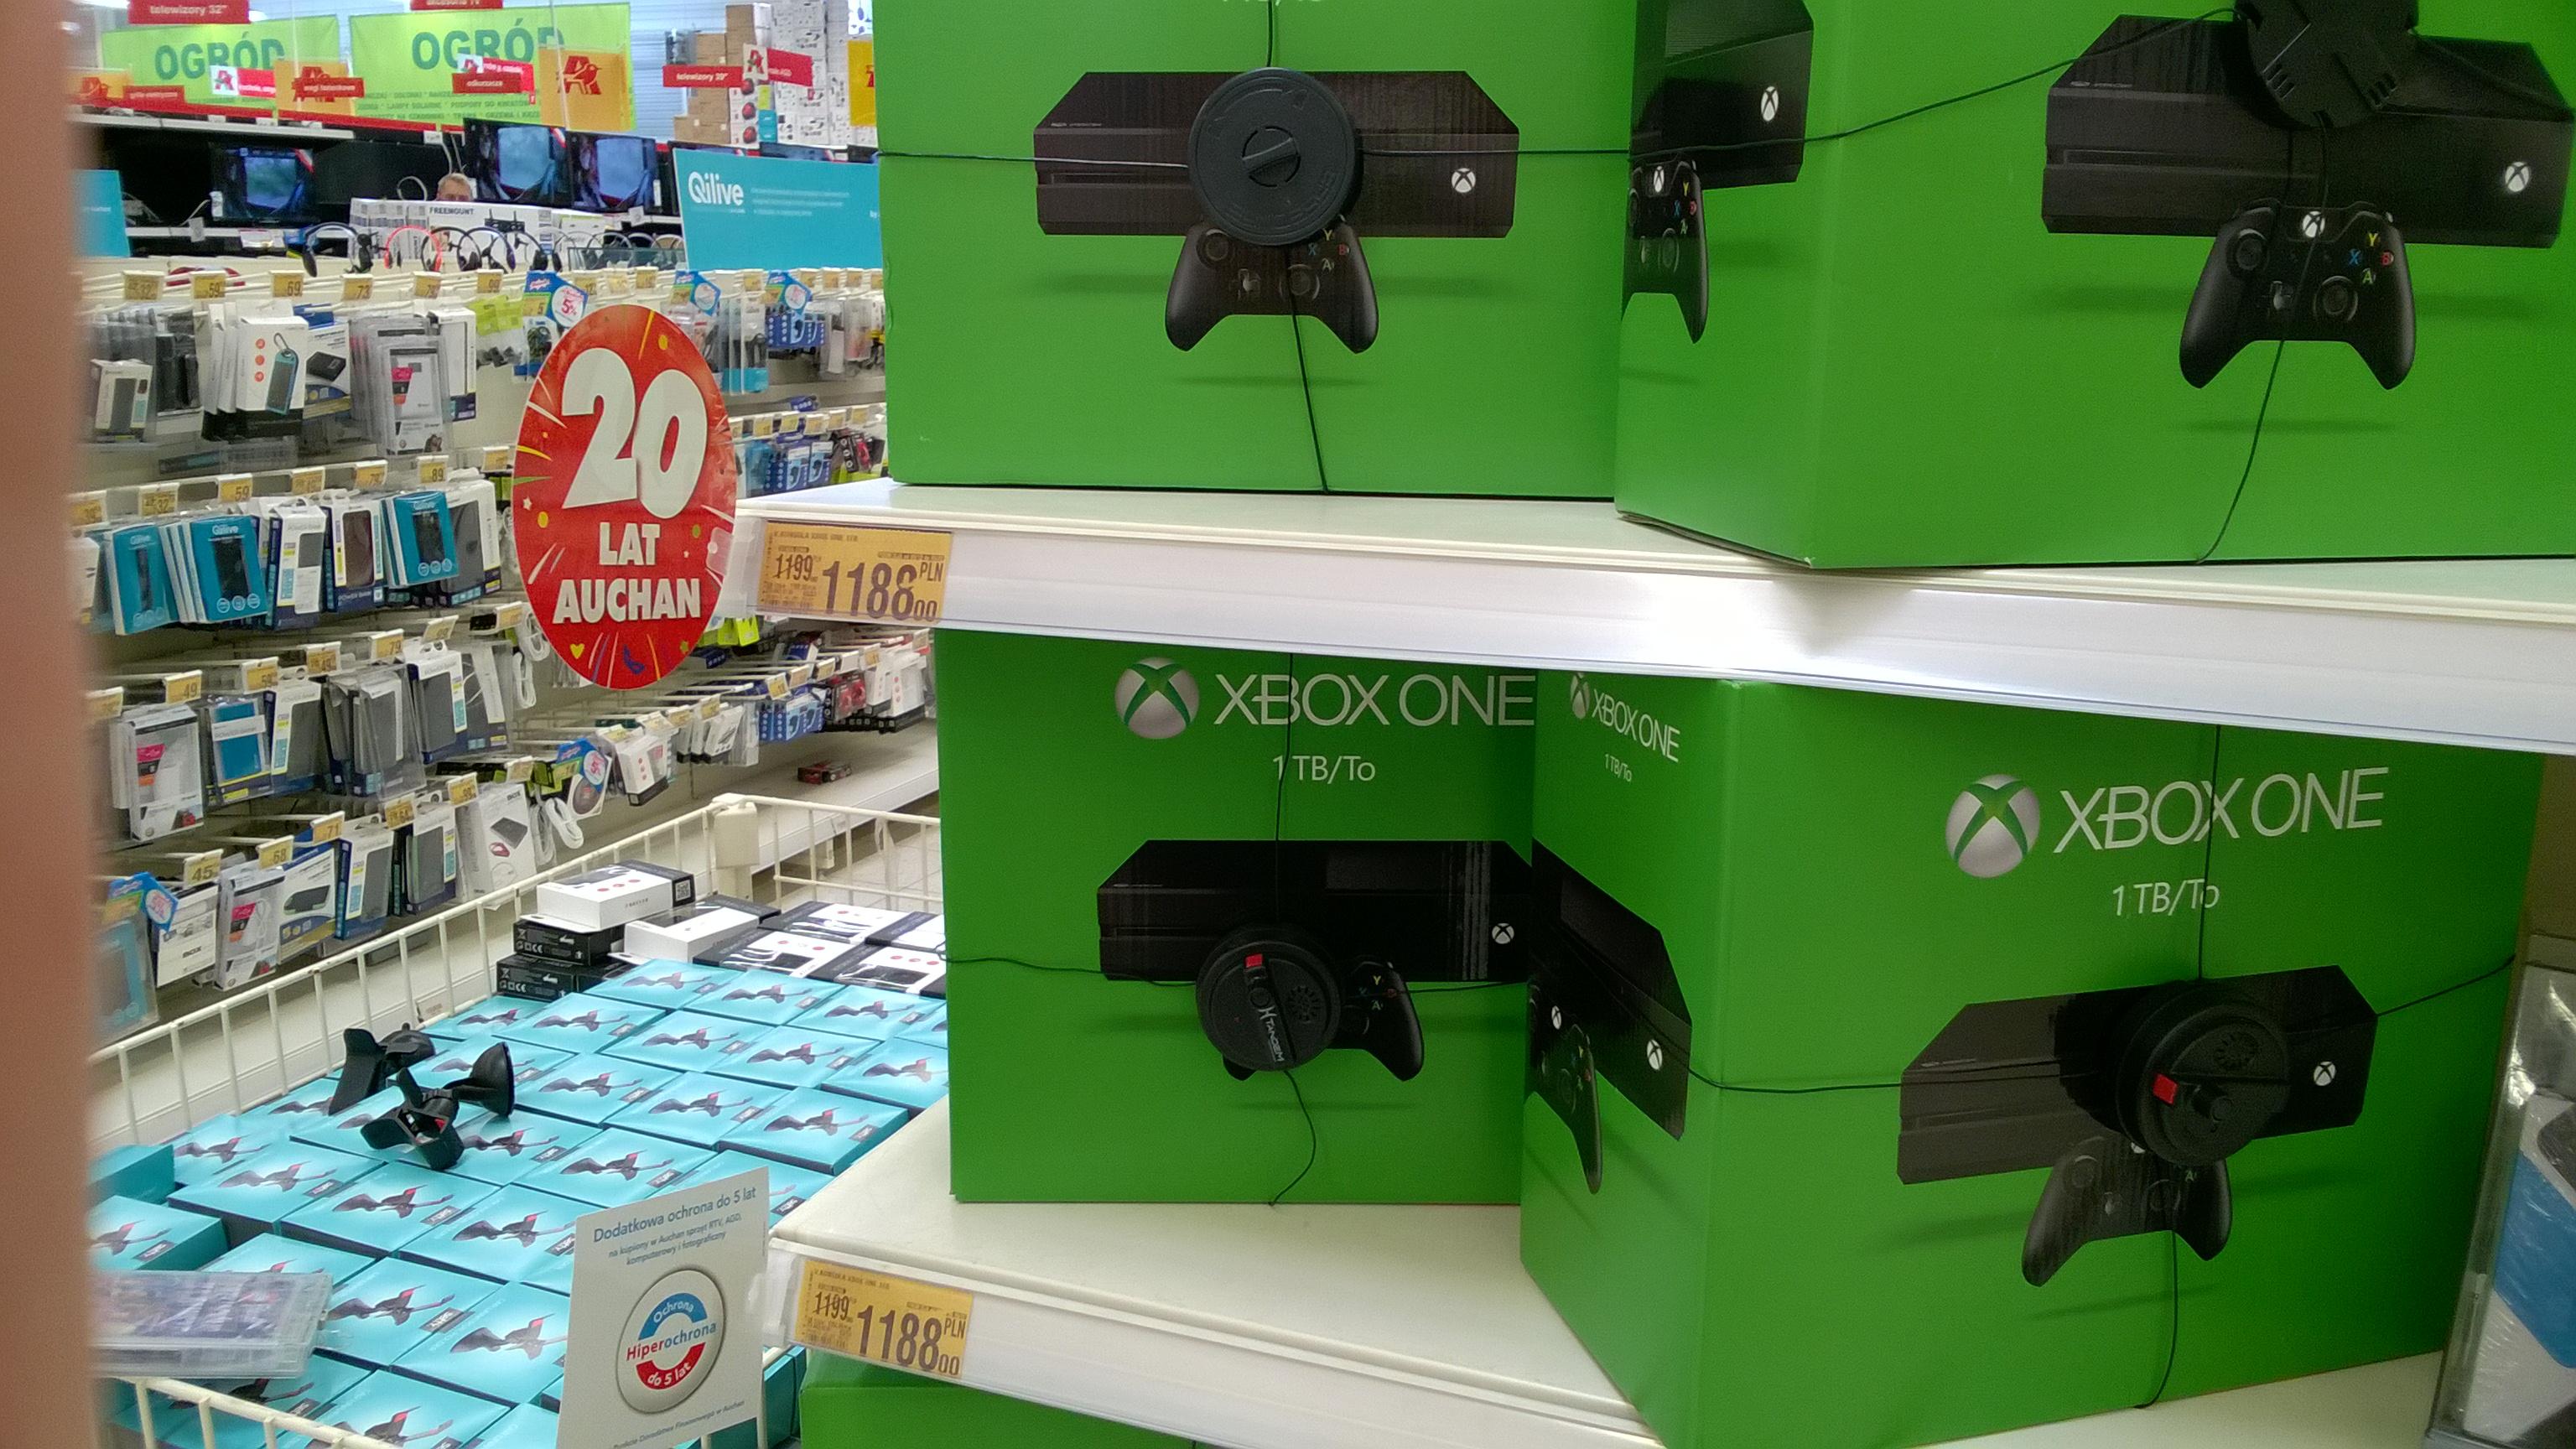 Konsola Xbox One /1 Tb